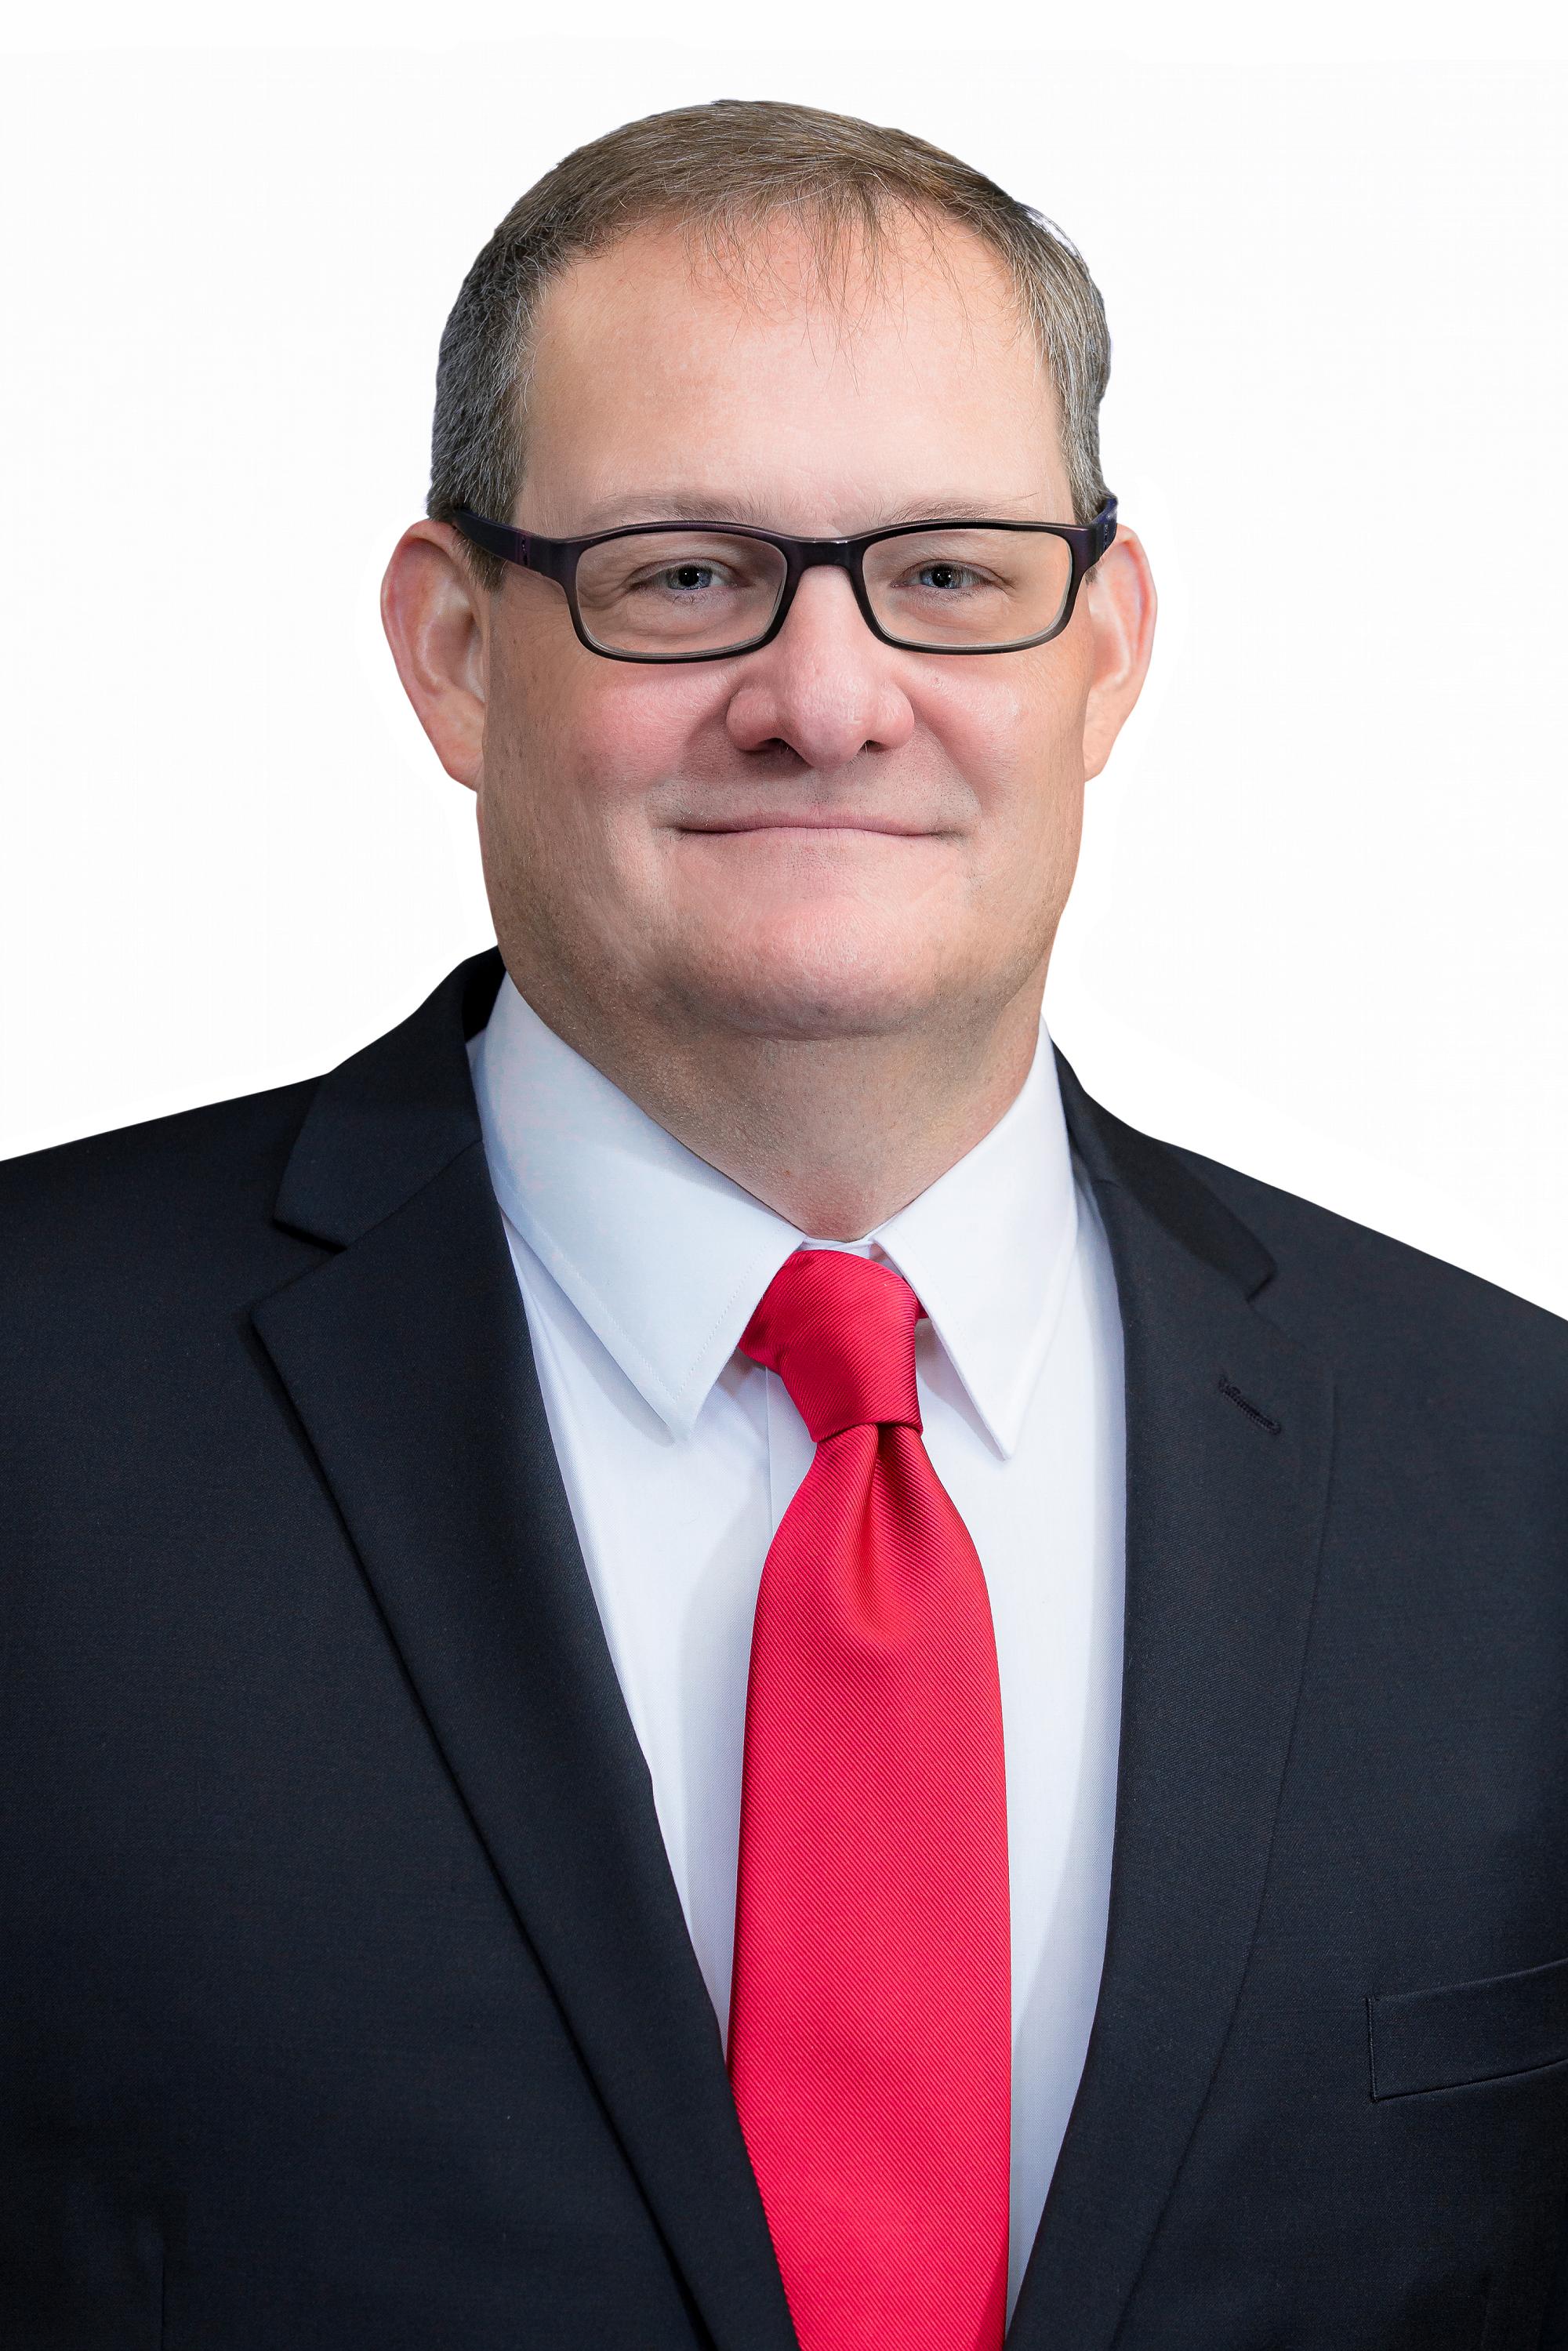 Jeffrey B. Burnette, MD